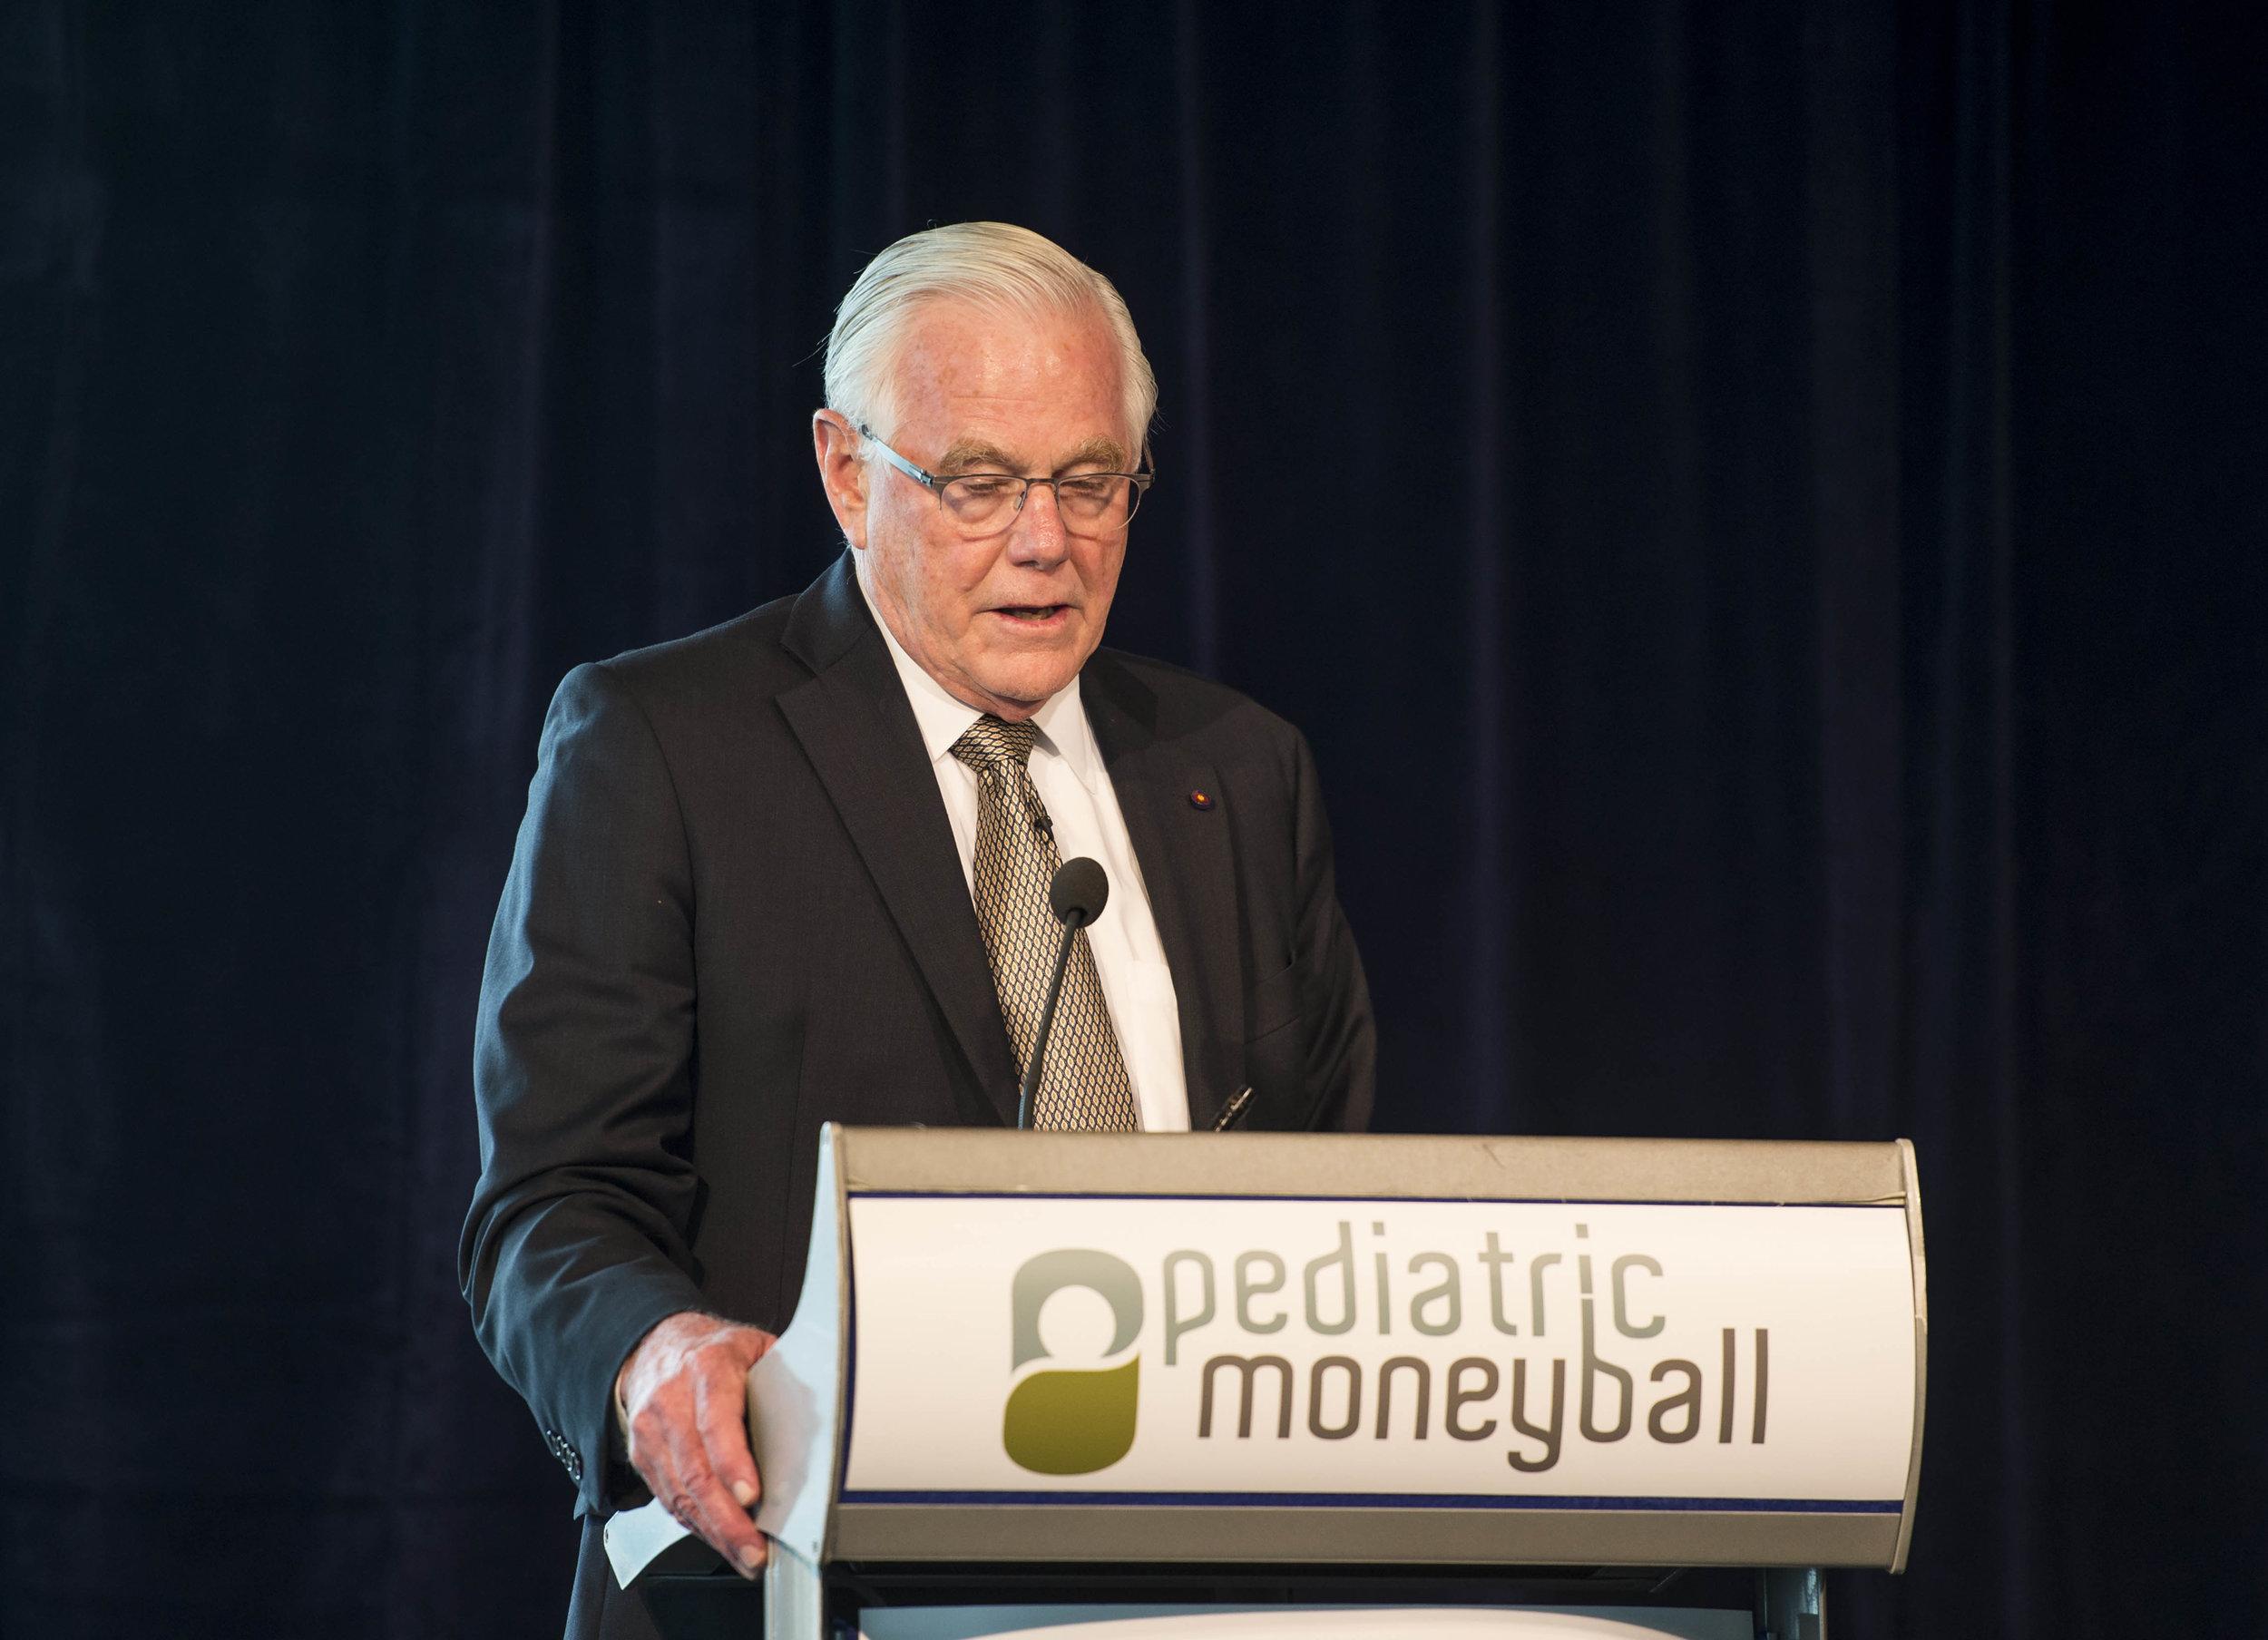 223-Pediatric MoneyBall-10.11.18.jpg